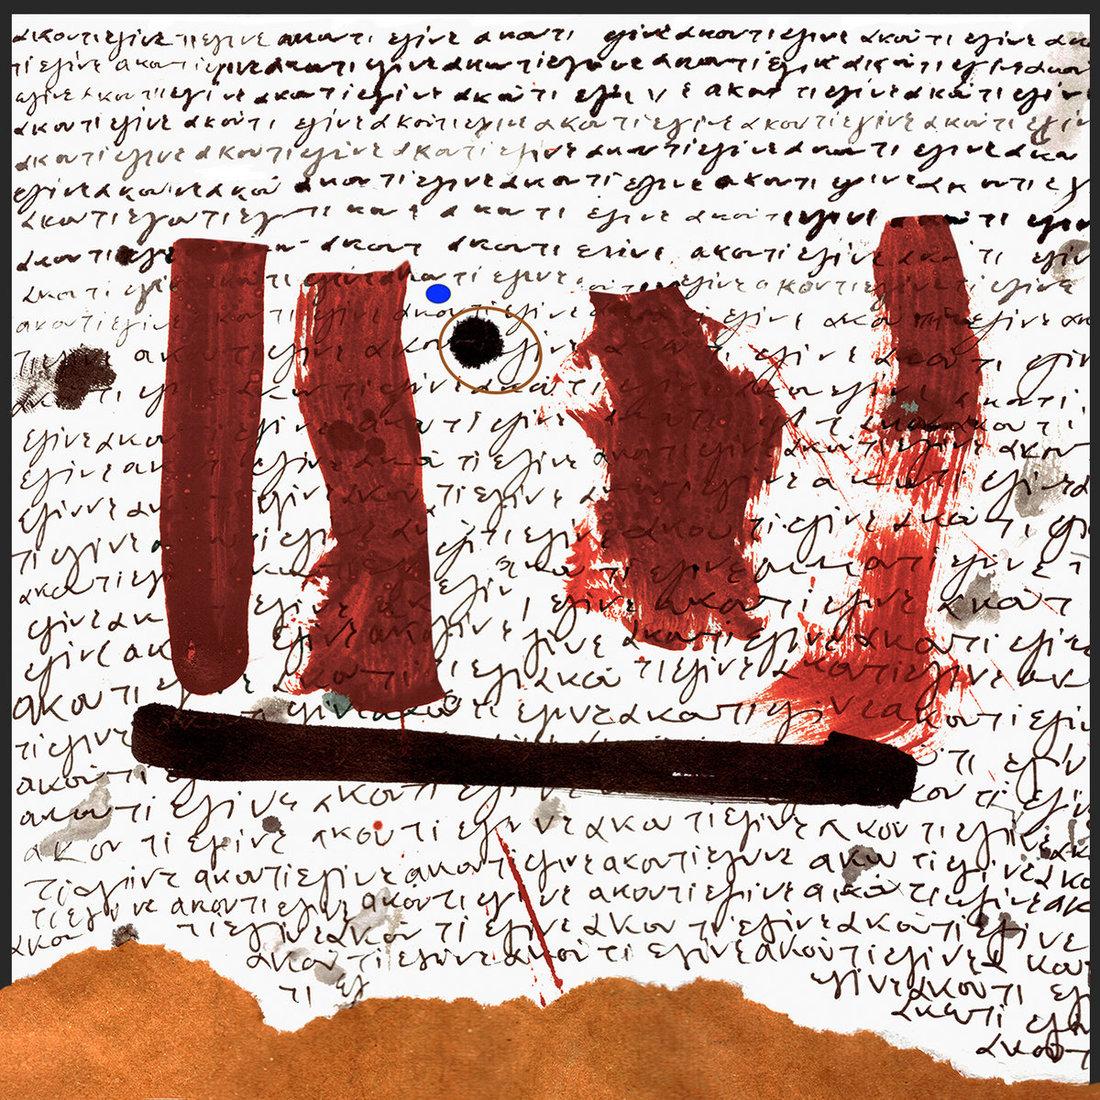 V.A. - 37 composers against police brutality (PONAO)